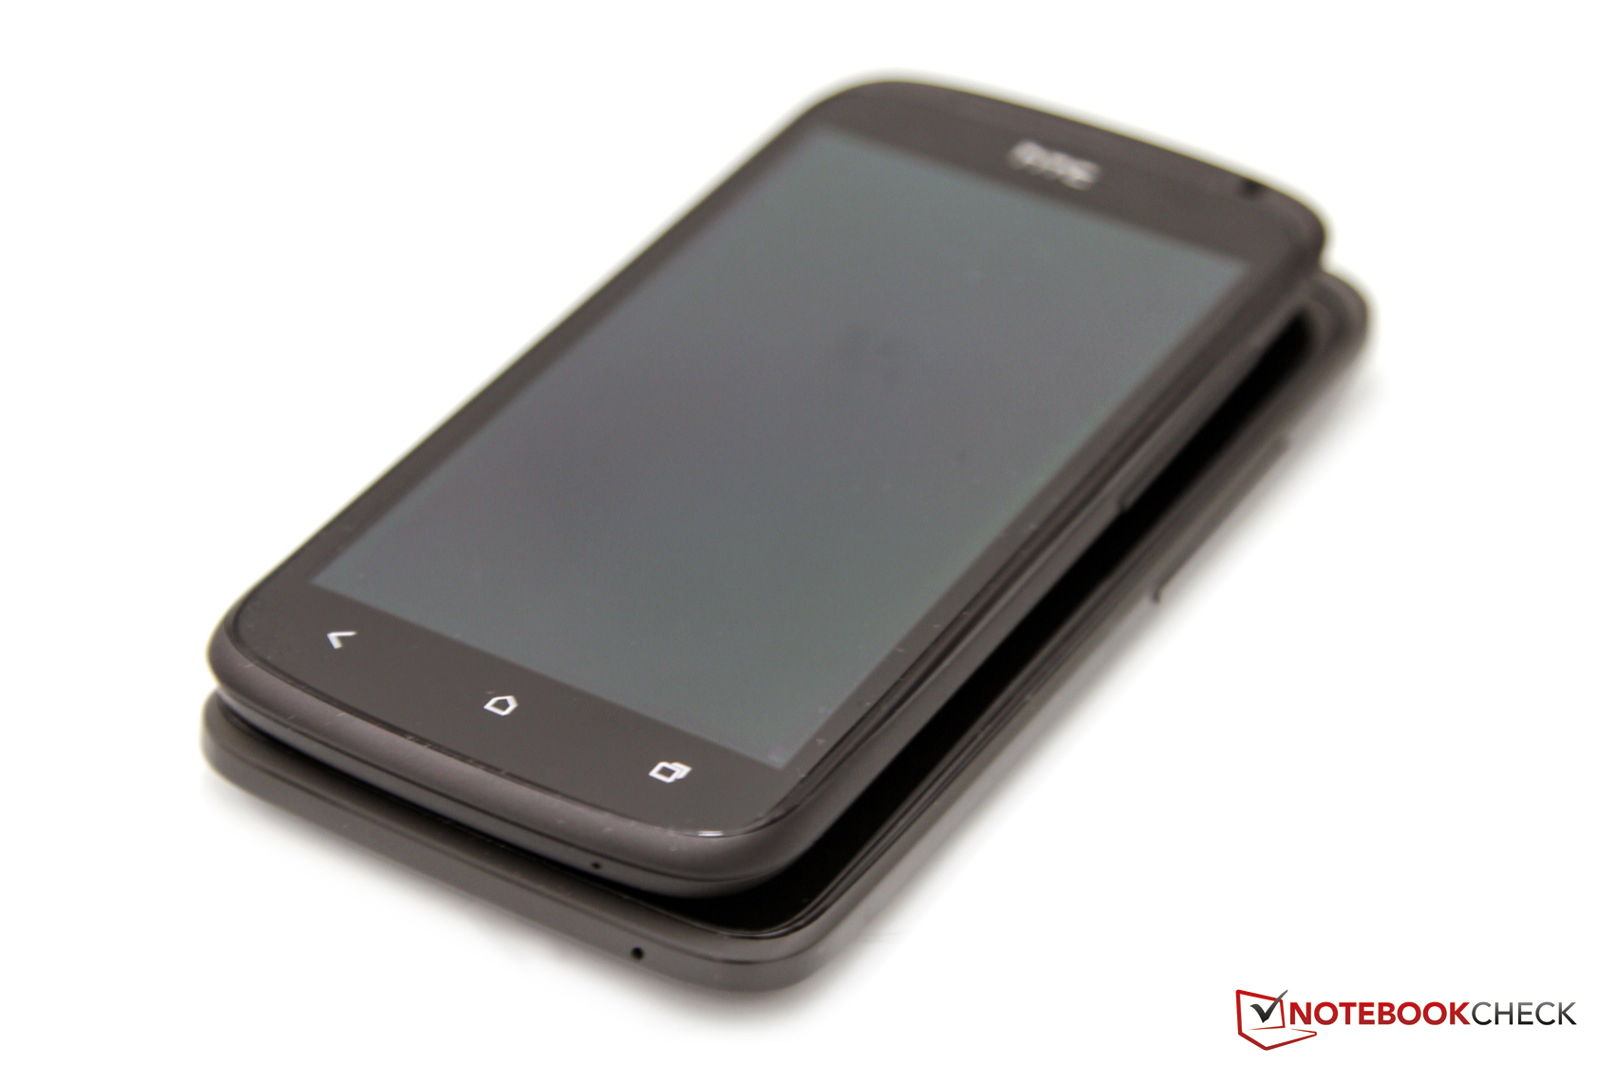 review htc one s vs htc one x tegra 3 smartphone notebookcheck rh notebookcheck net HTC One V Unlocked HTC One V Beats Audio